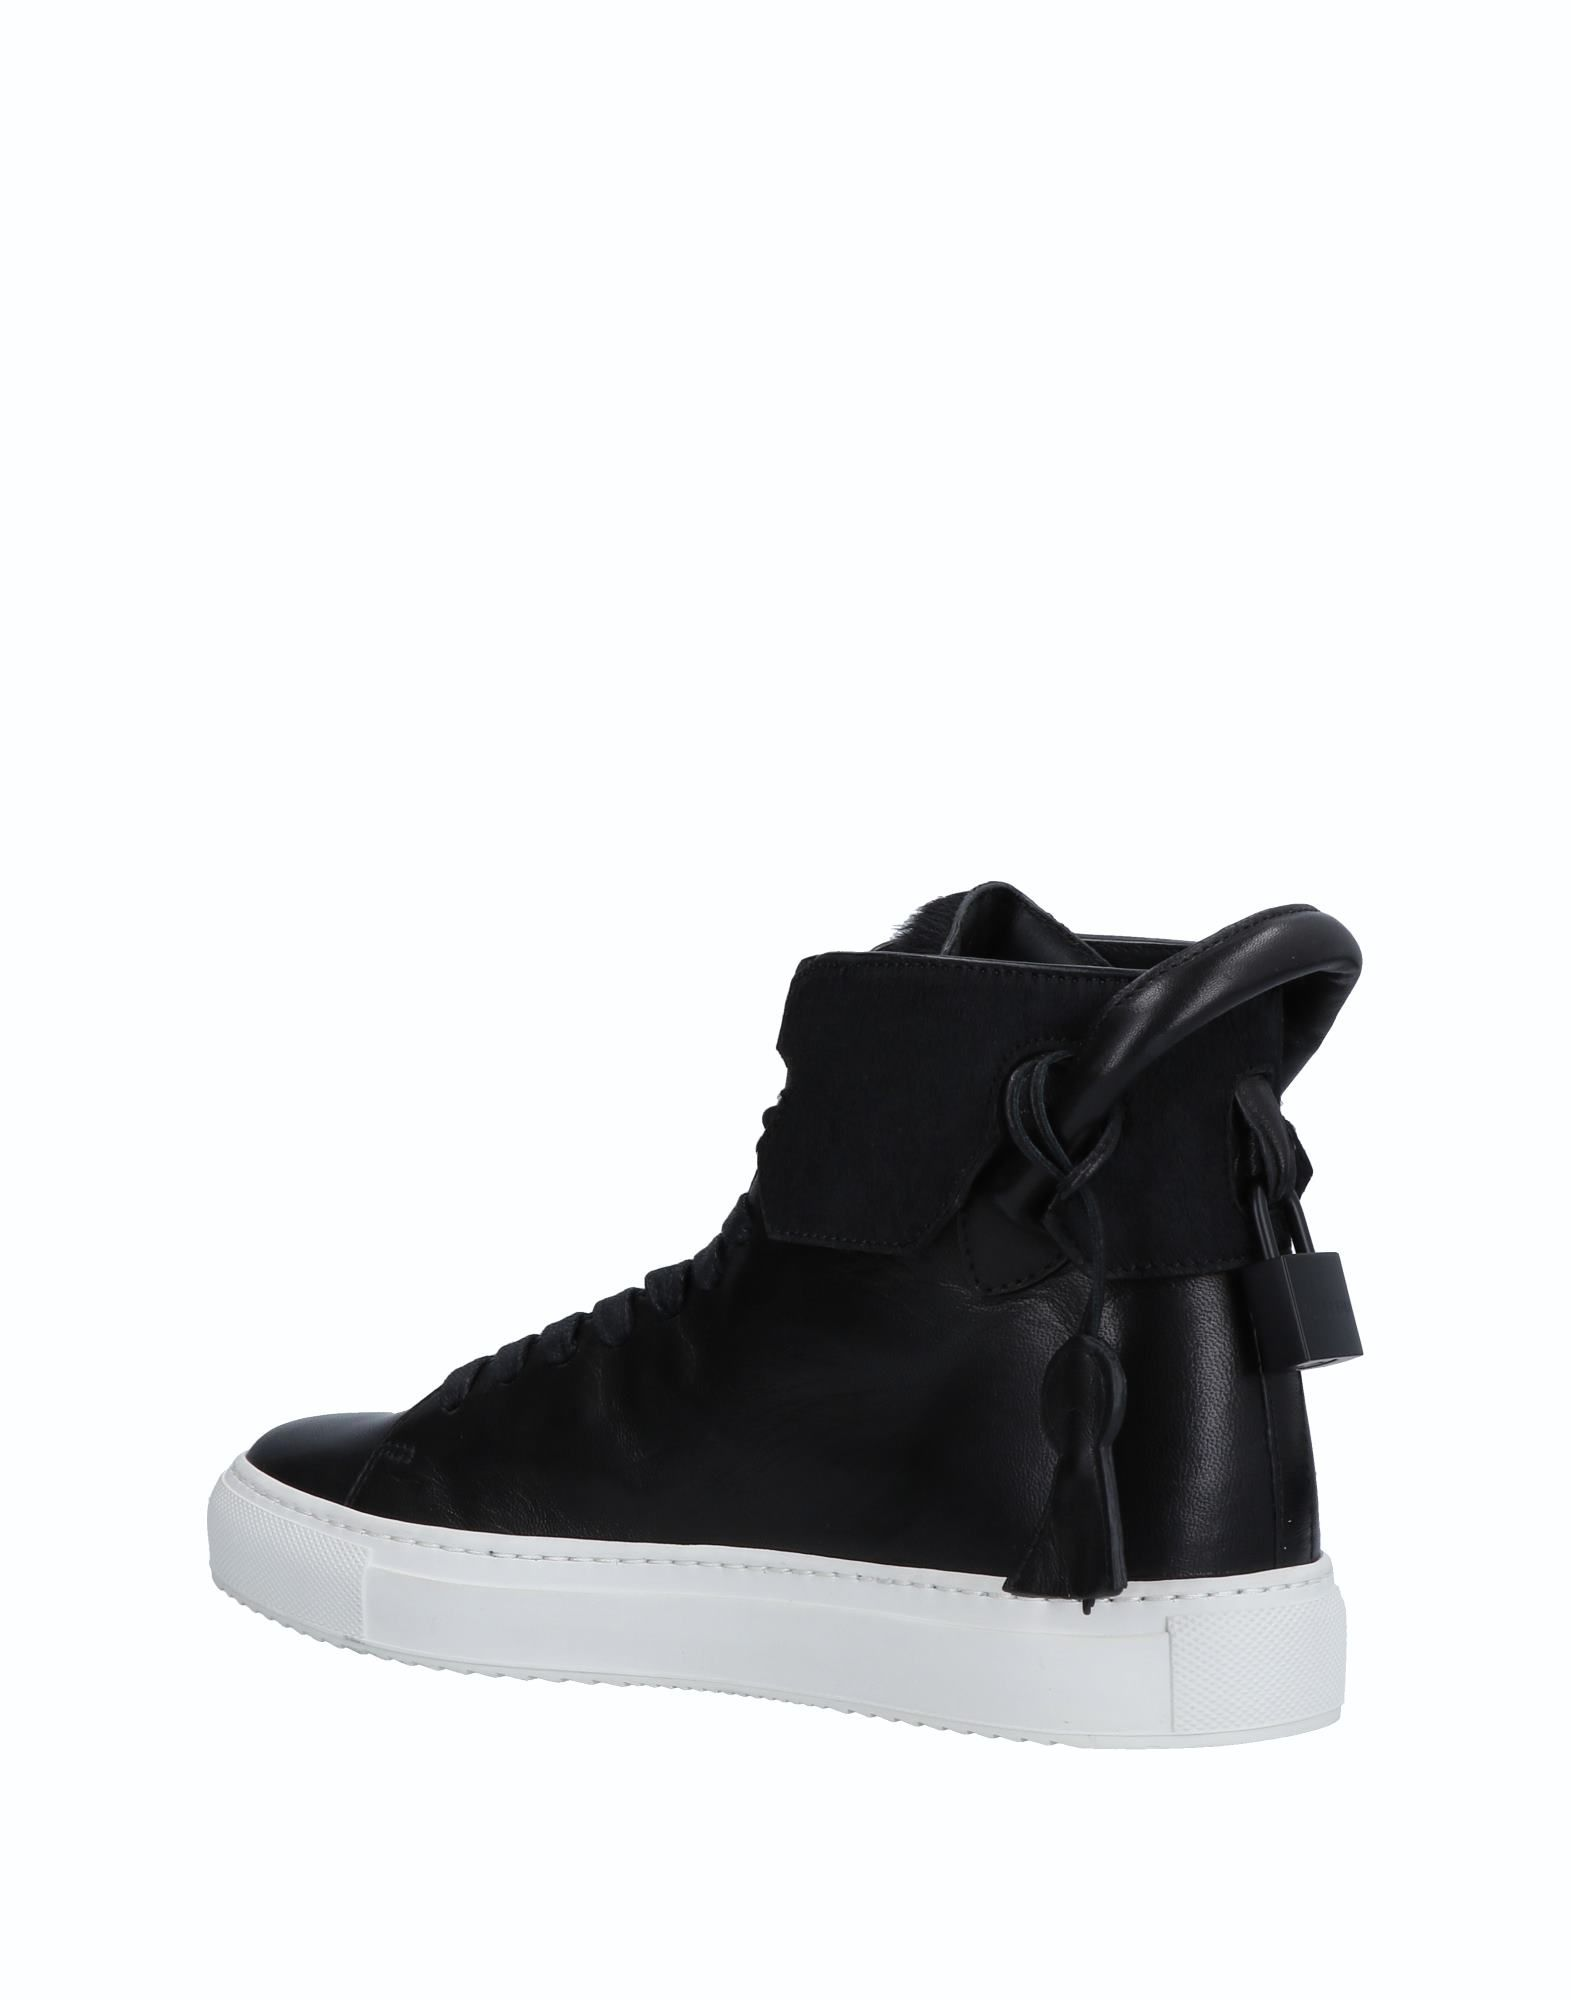 Buscemi Sneakers aussehende Damen  11506456JJGünstige gut aussehende Sneakers Schuhe fe5304